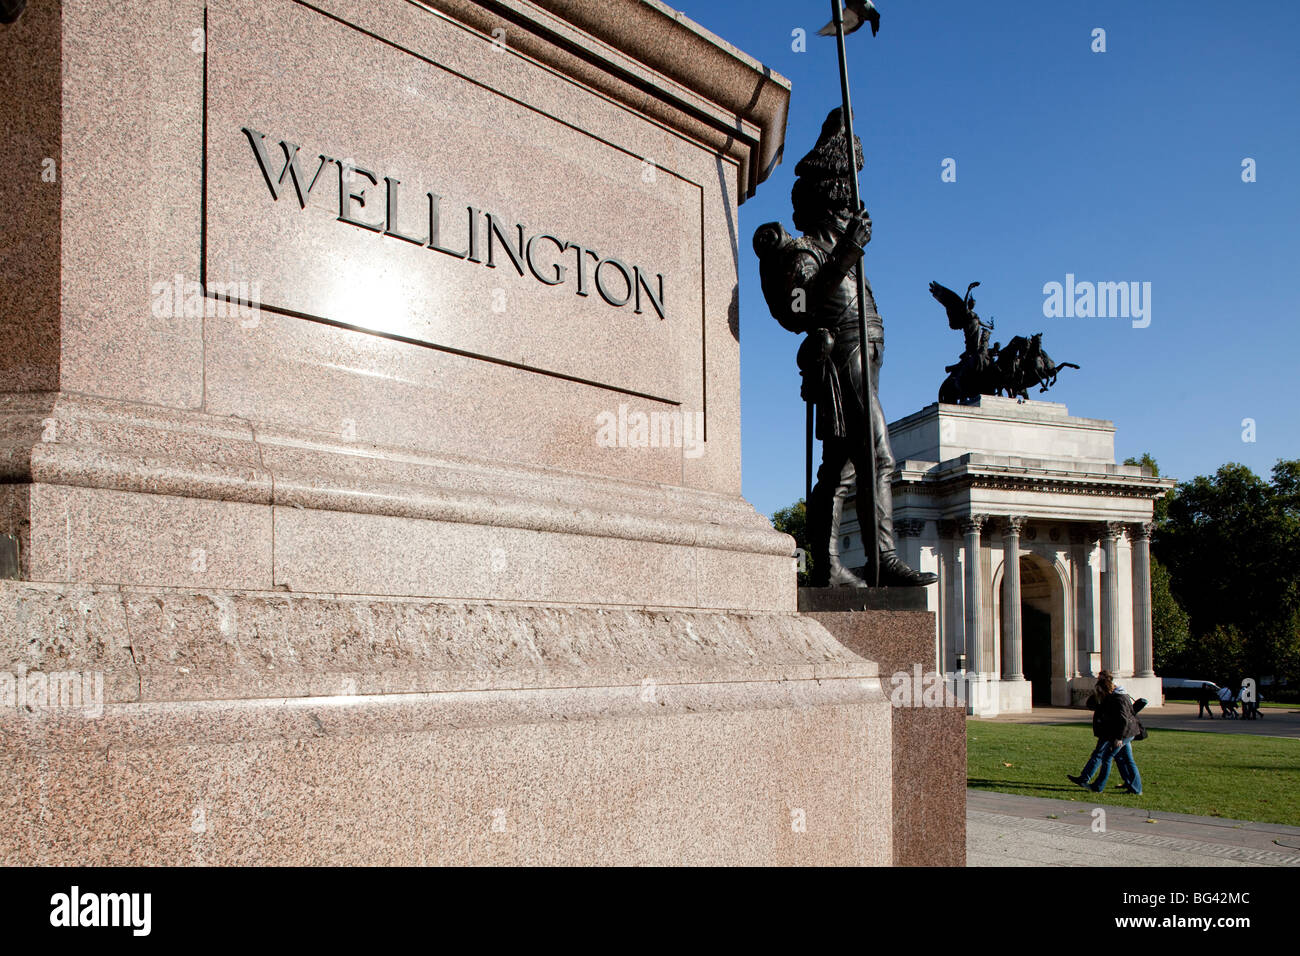 Wellington Arch, Hyde Park Corner, London, England - Stock Image